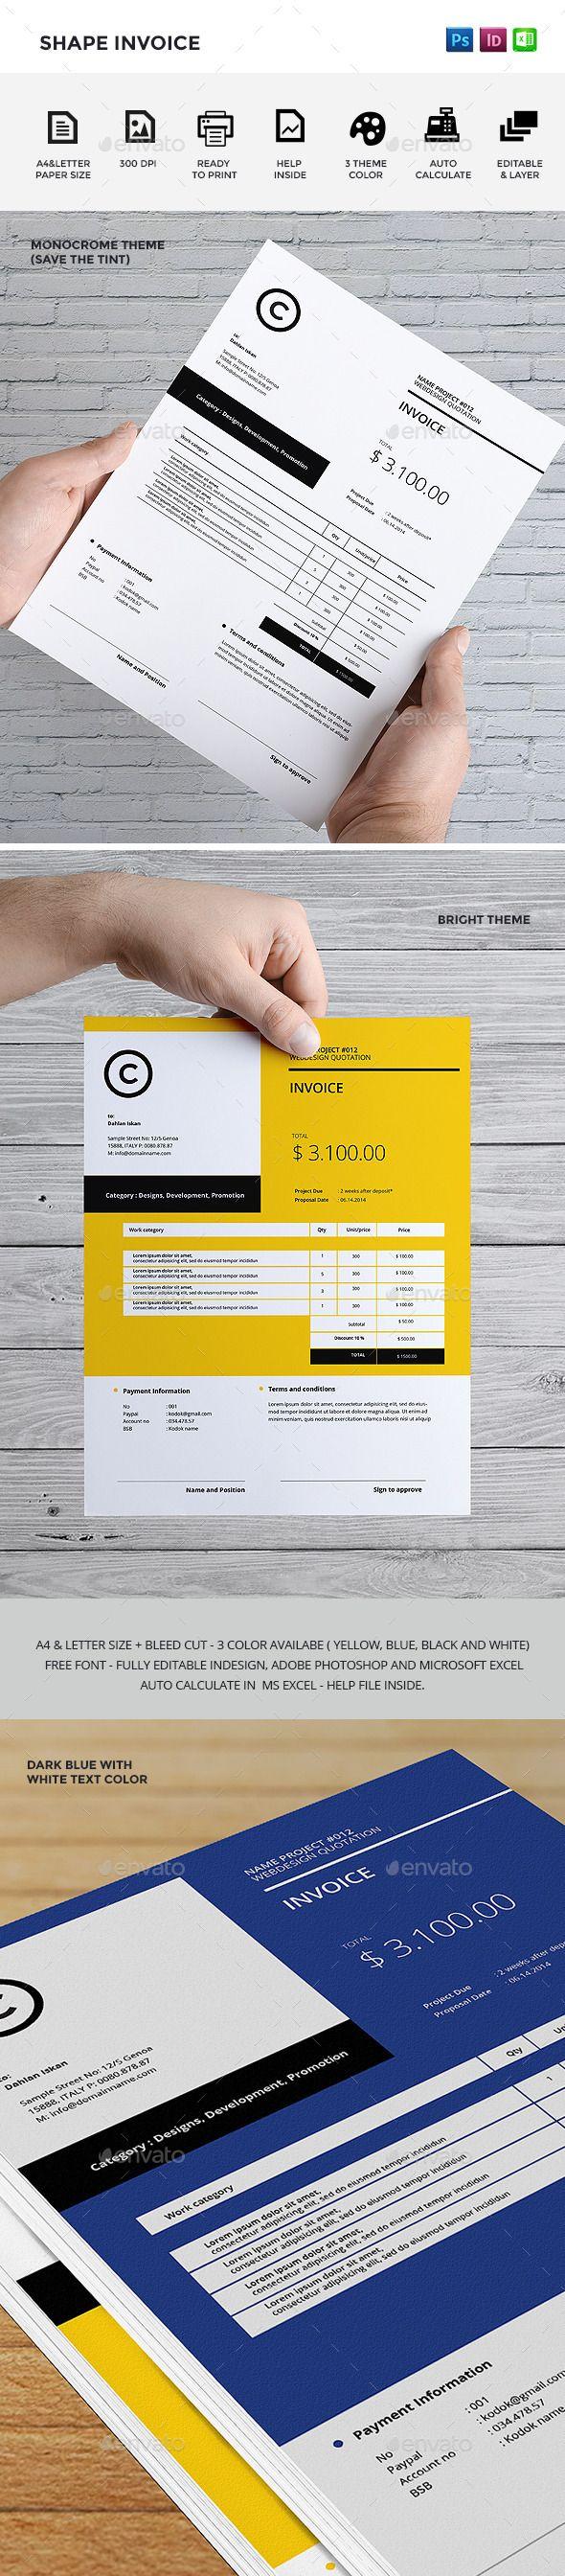 Shape Invoice   Diseño de factura, Papelería y Papeleria corporativa